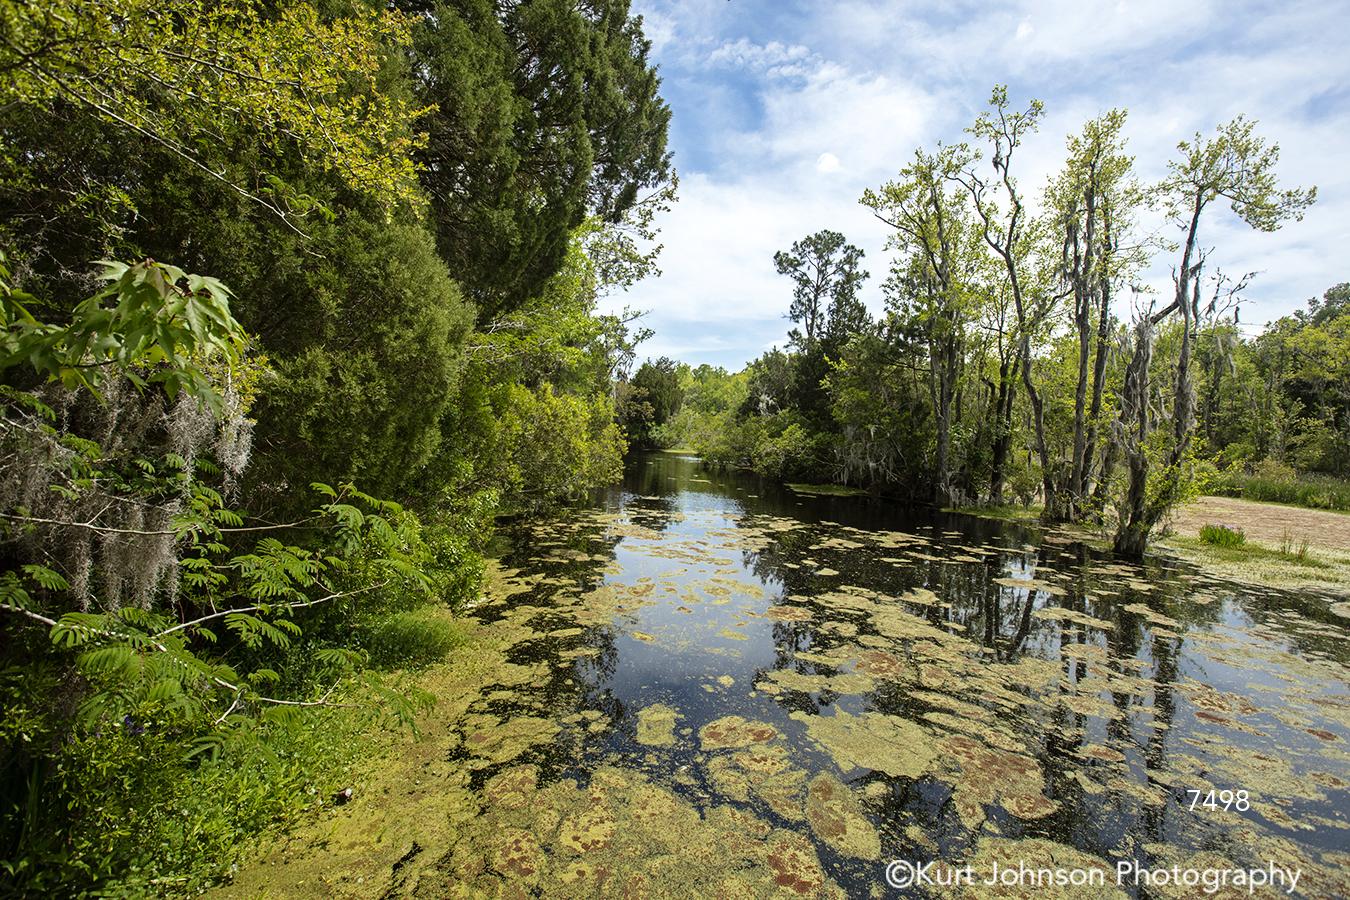 southeast charleston south carolina waterscape green swamp trees